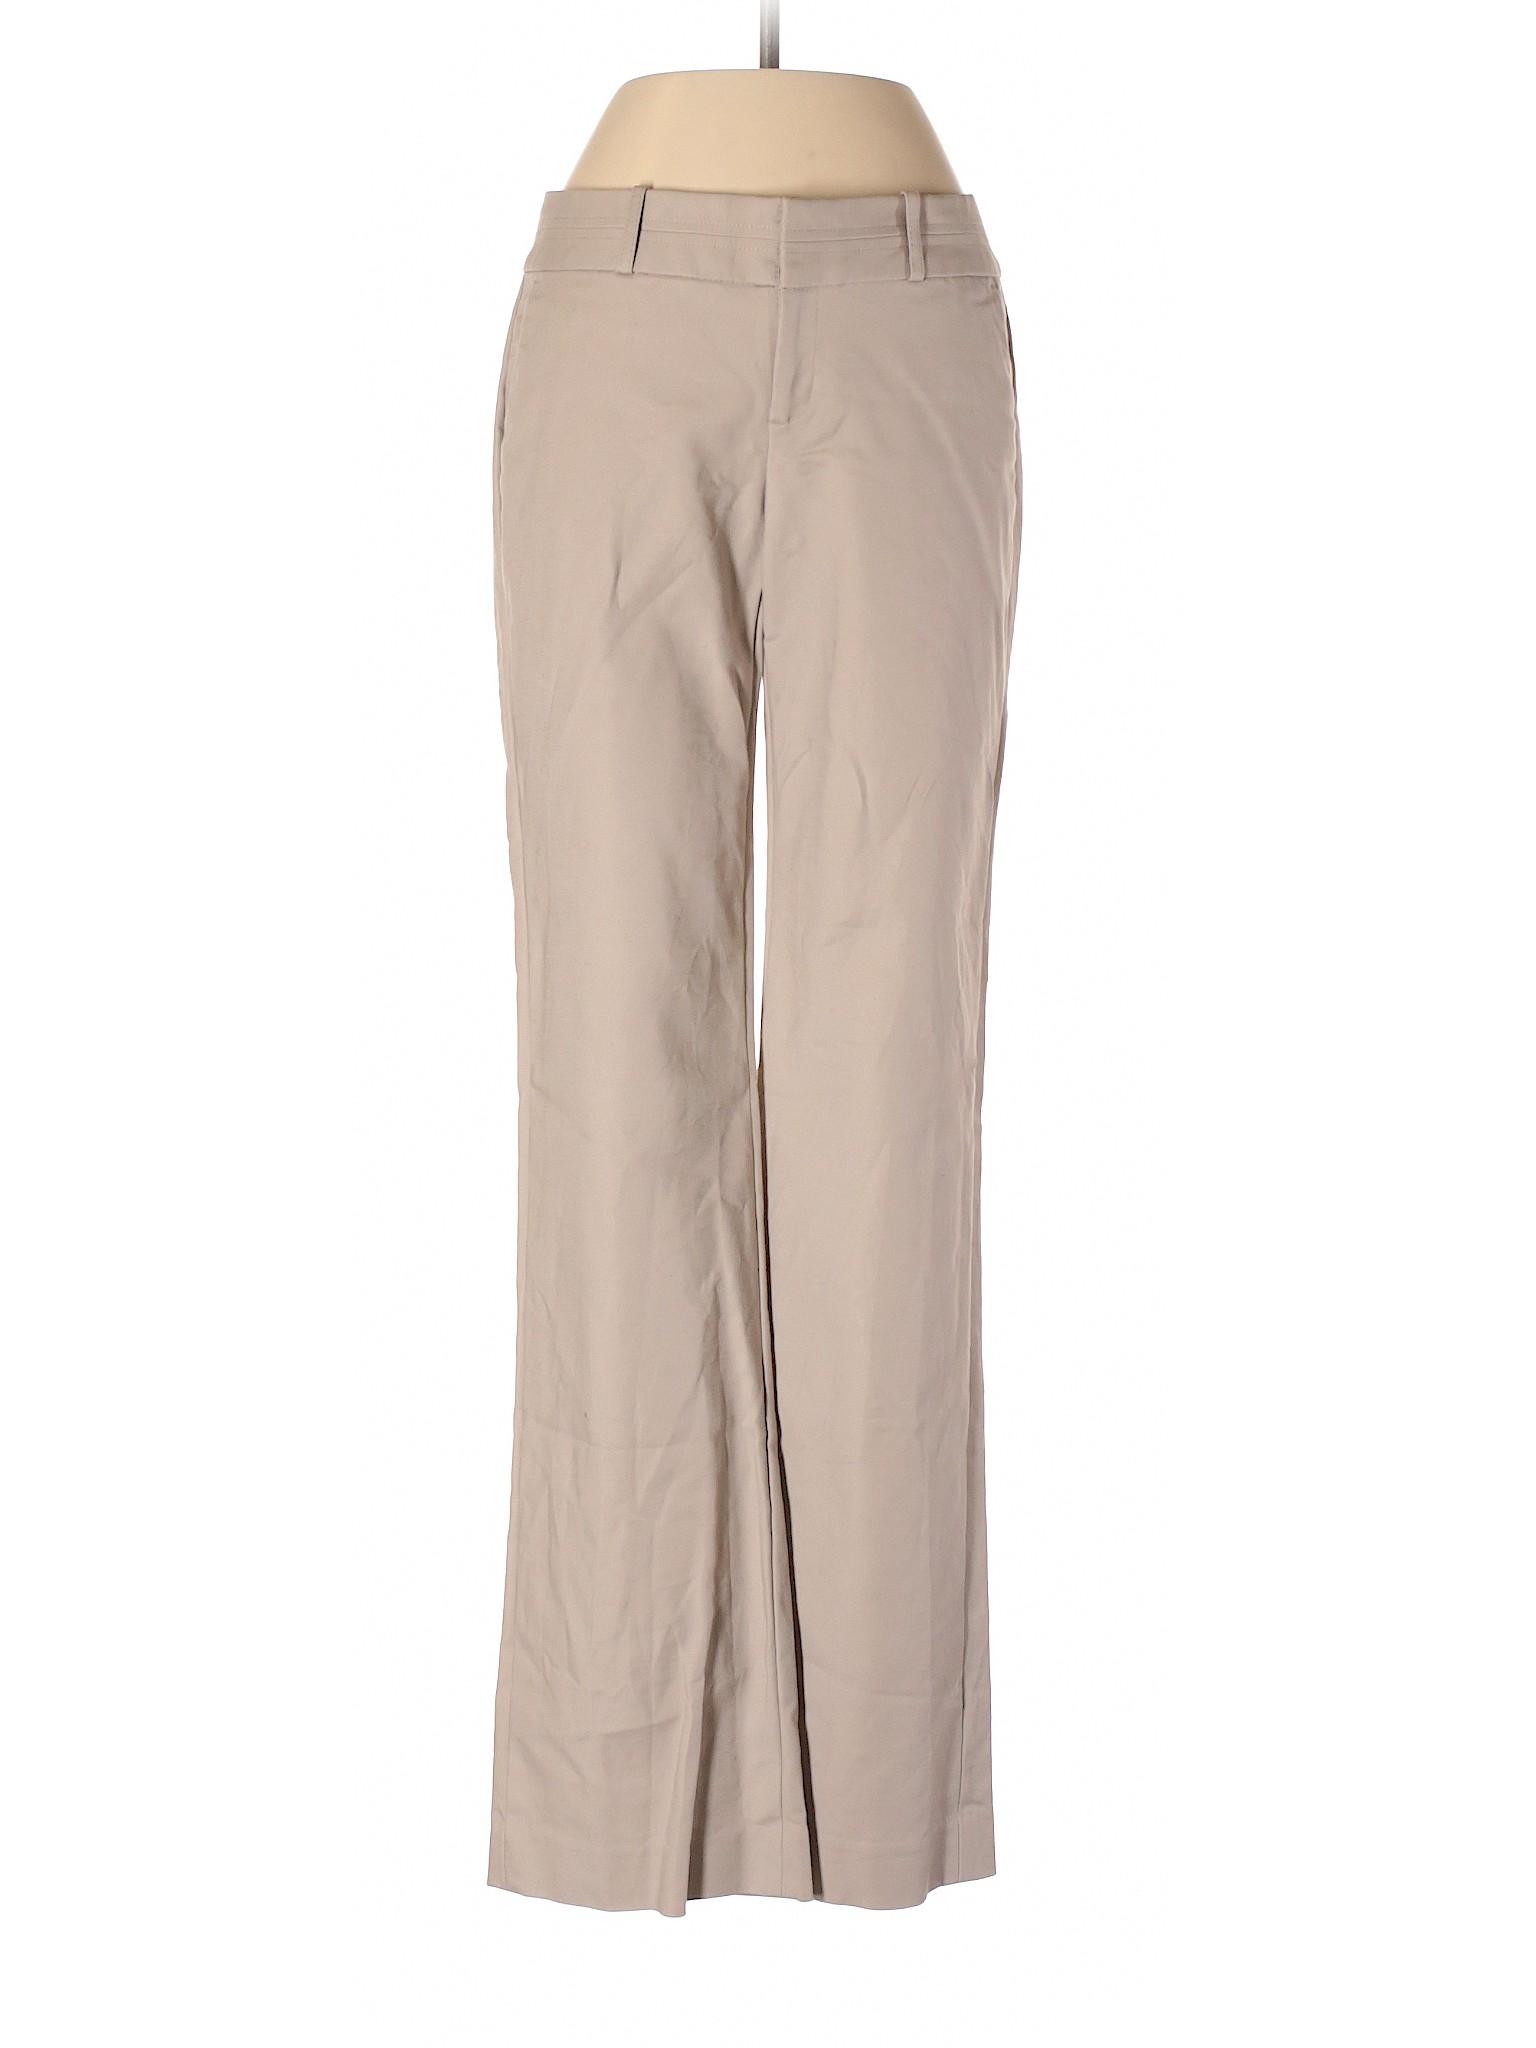 Pants Dress Banana leisure Boutique Republic tFaIxHq